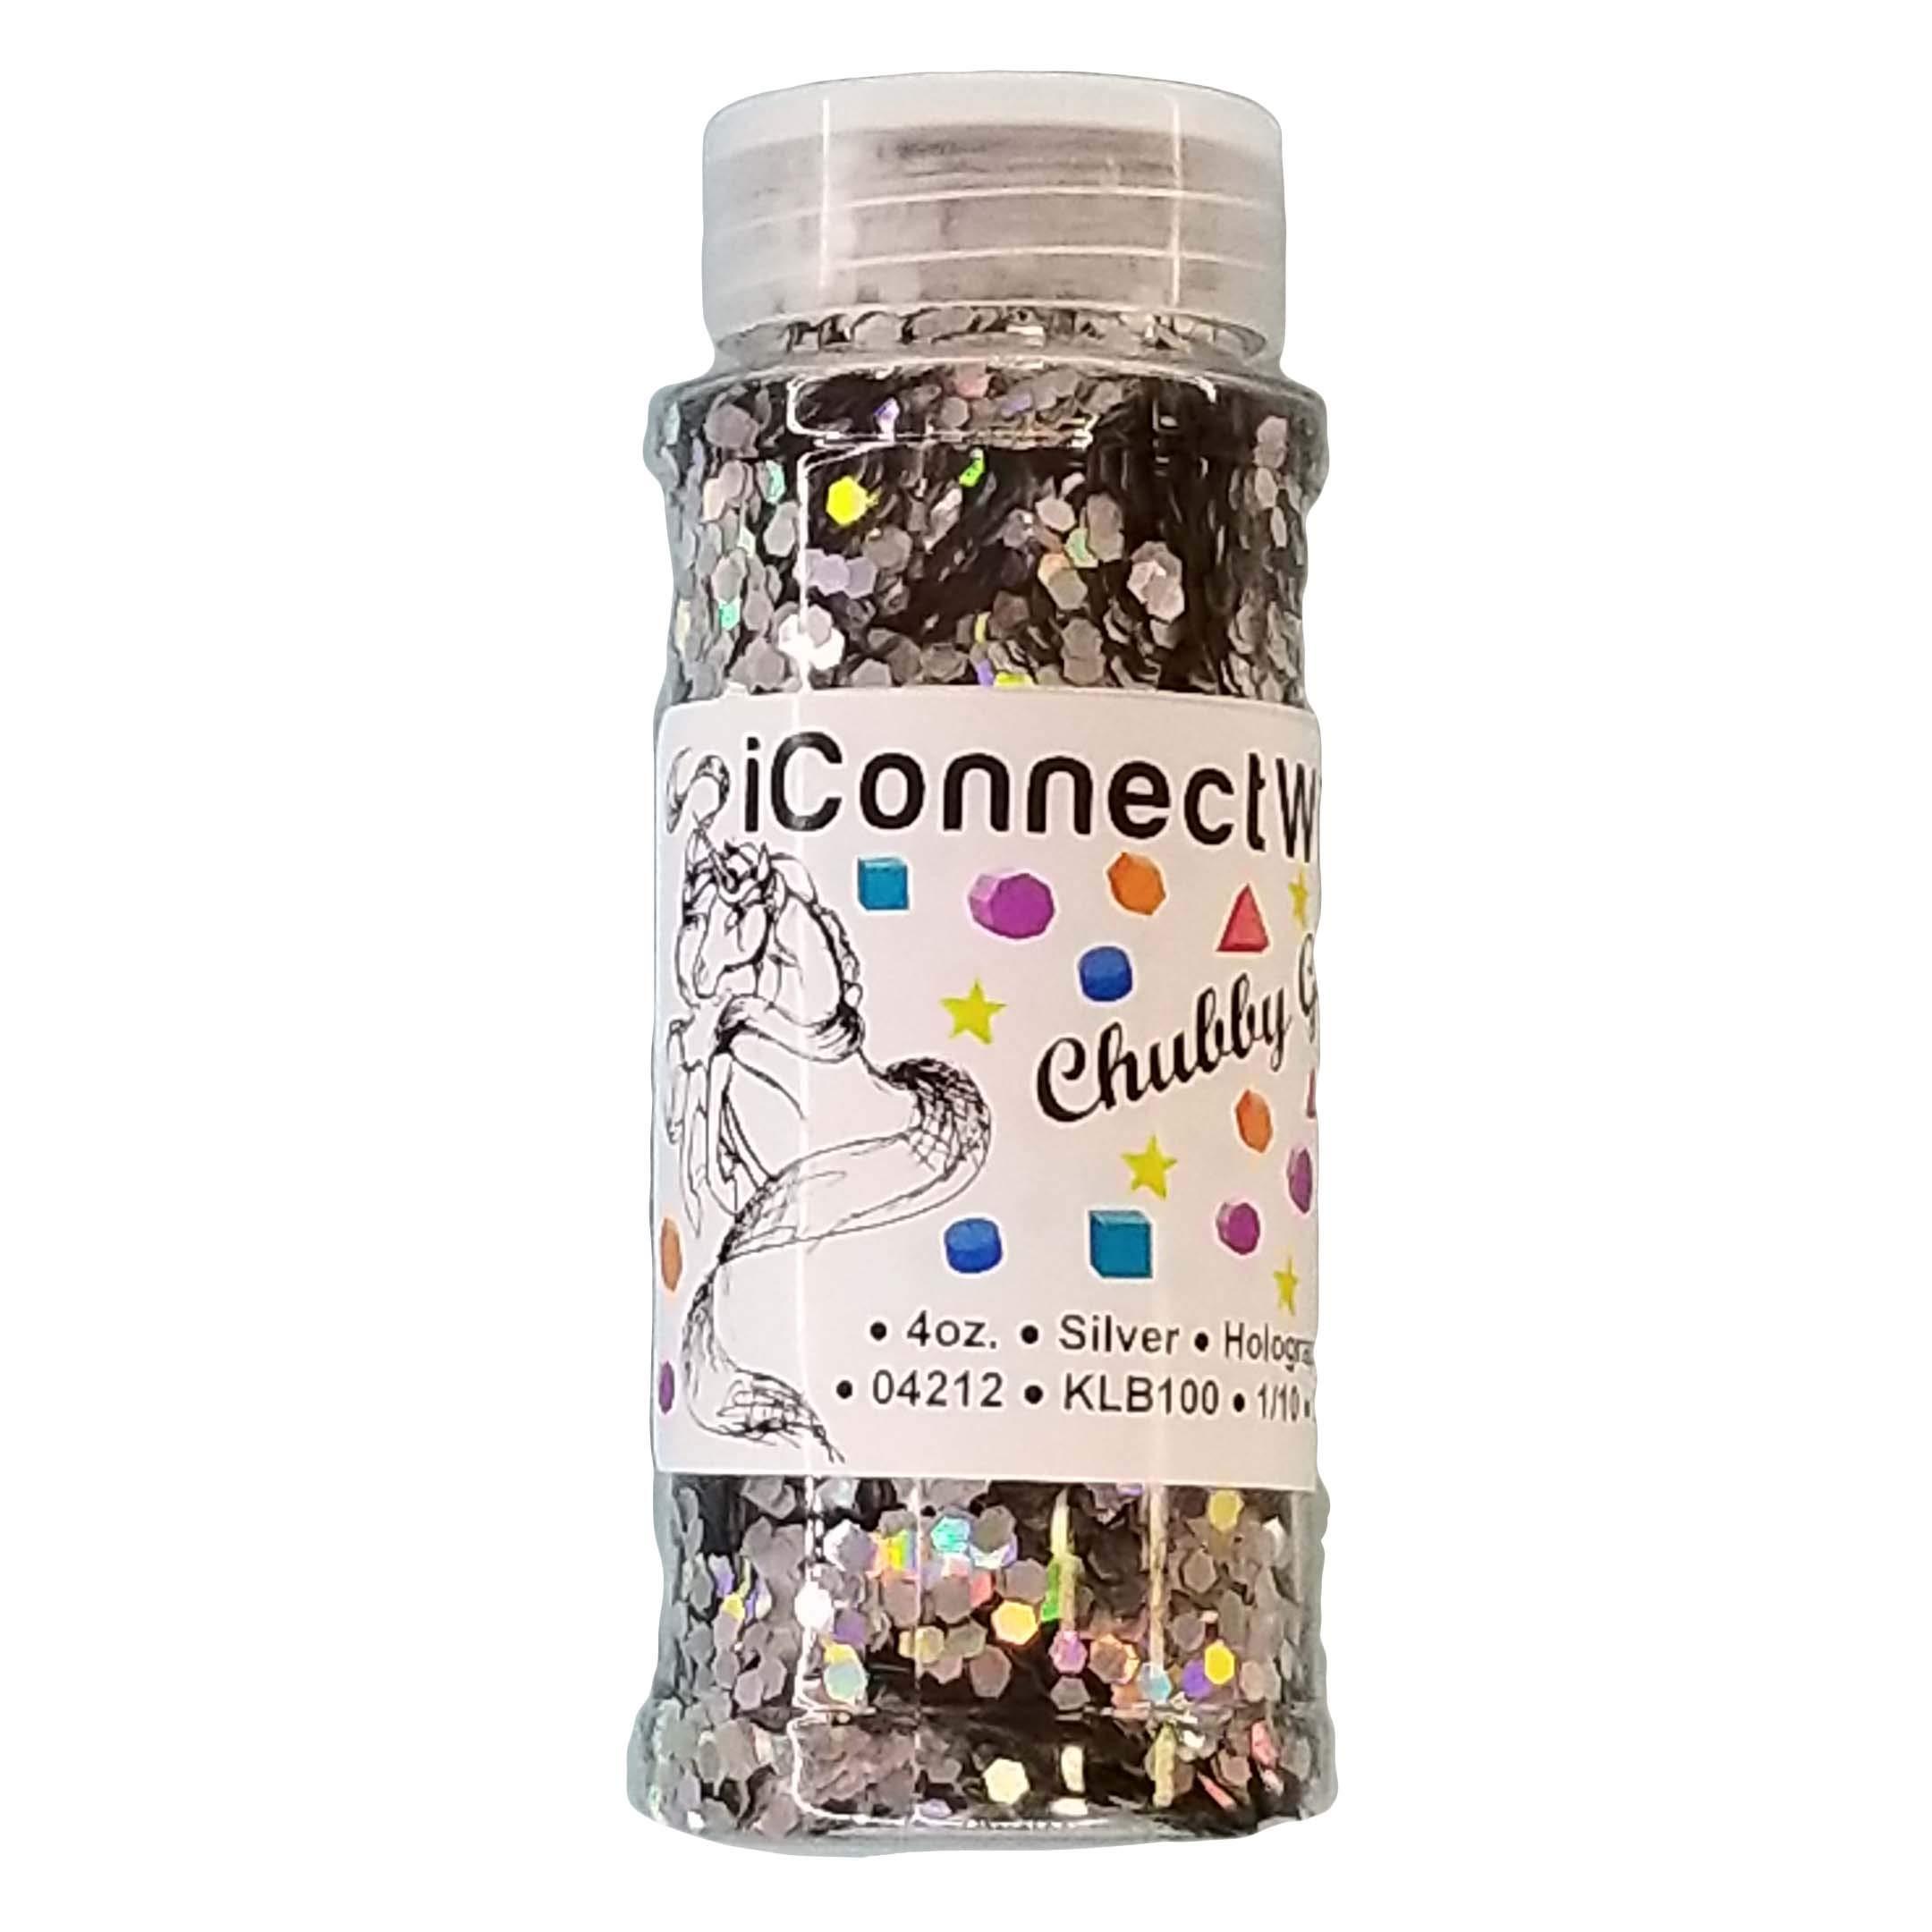 Silver, Chubby Glitter 1/10, 4oz Bottle, Holographic Craft Glitter